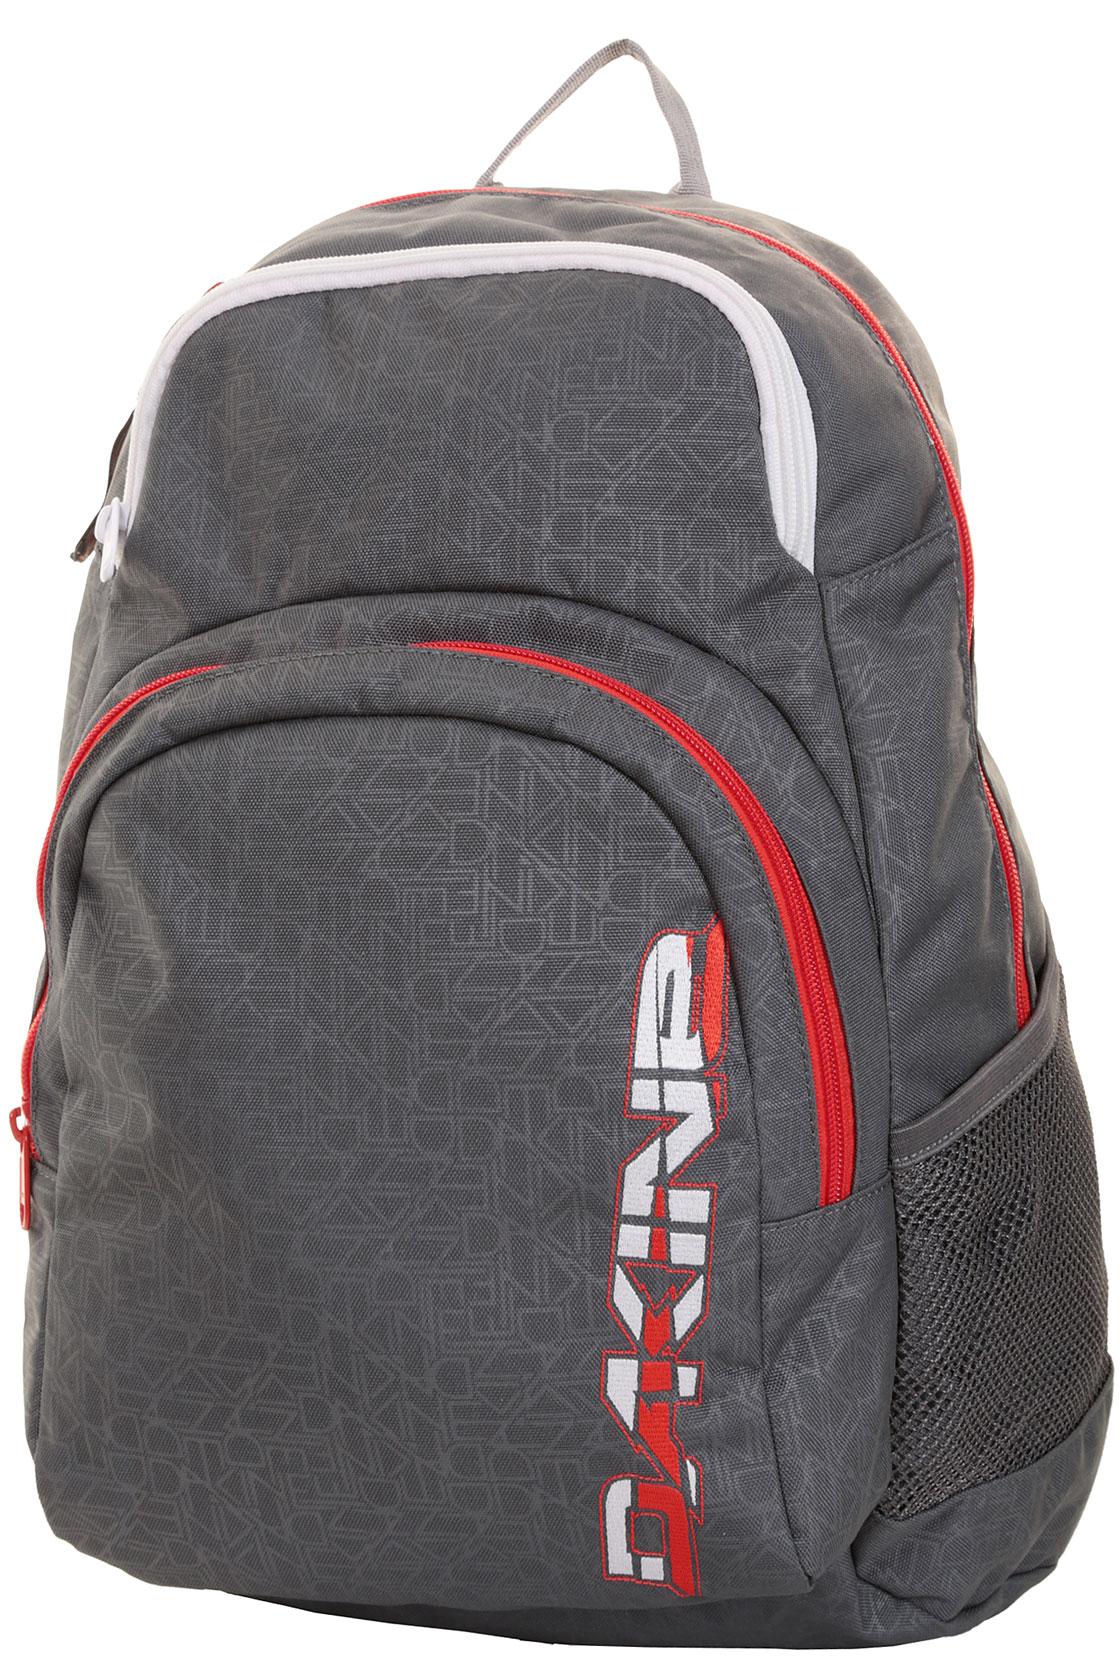 Dakine Central Backpack (domain) buy at skatedeluxe